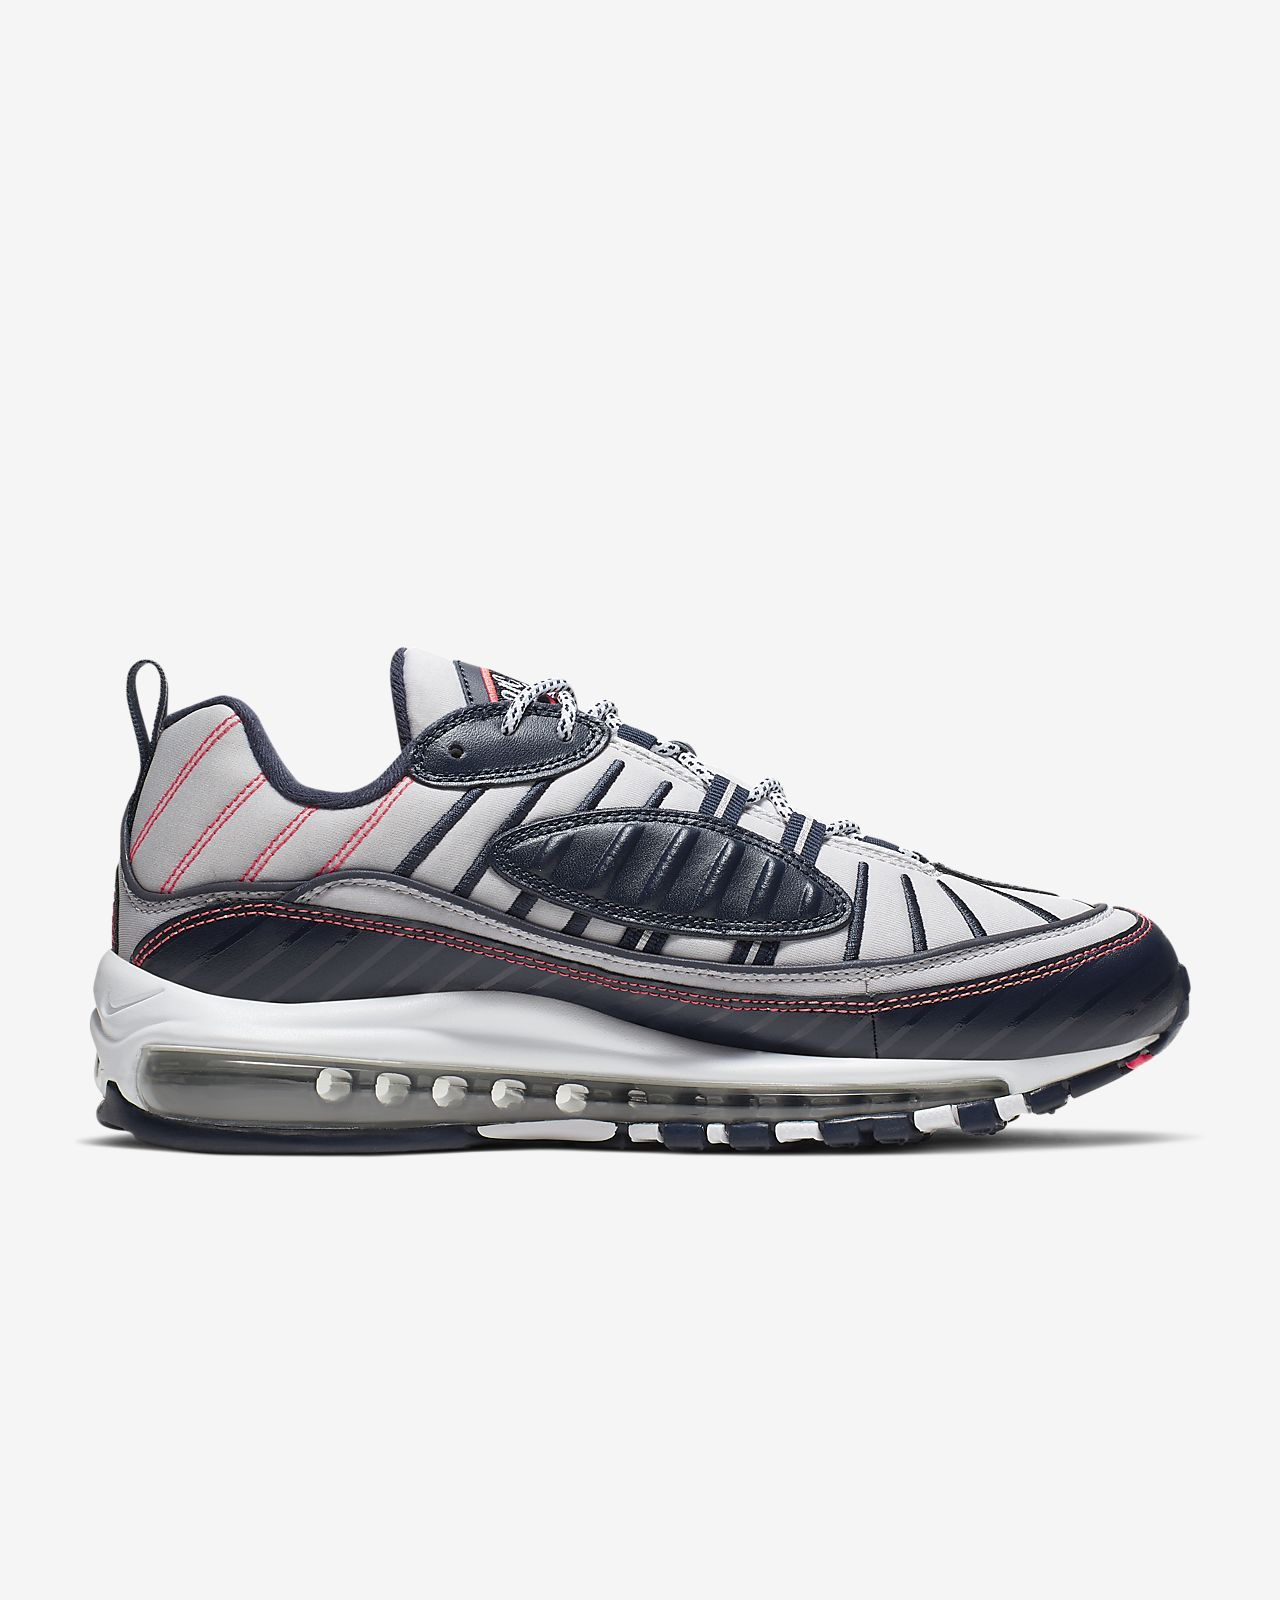 Men's Nike Air Max 98 Casual Shoes